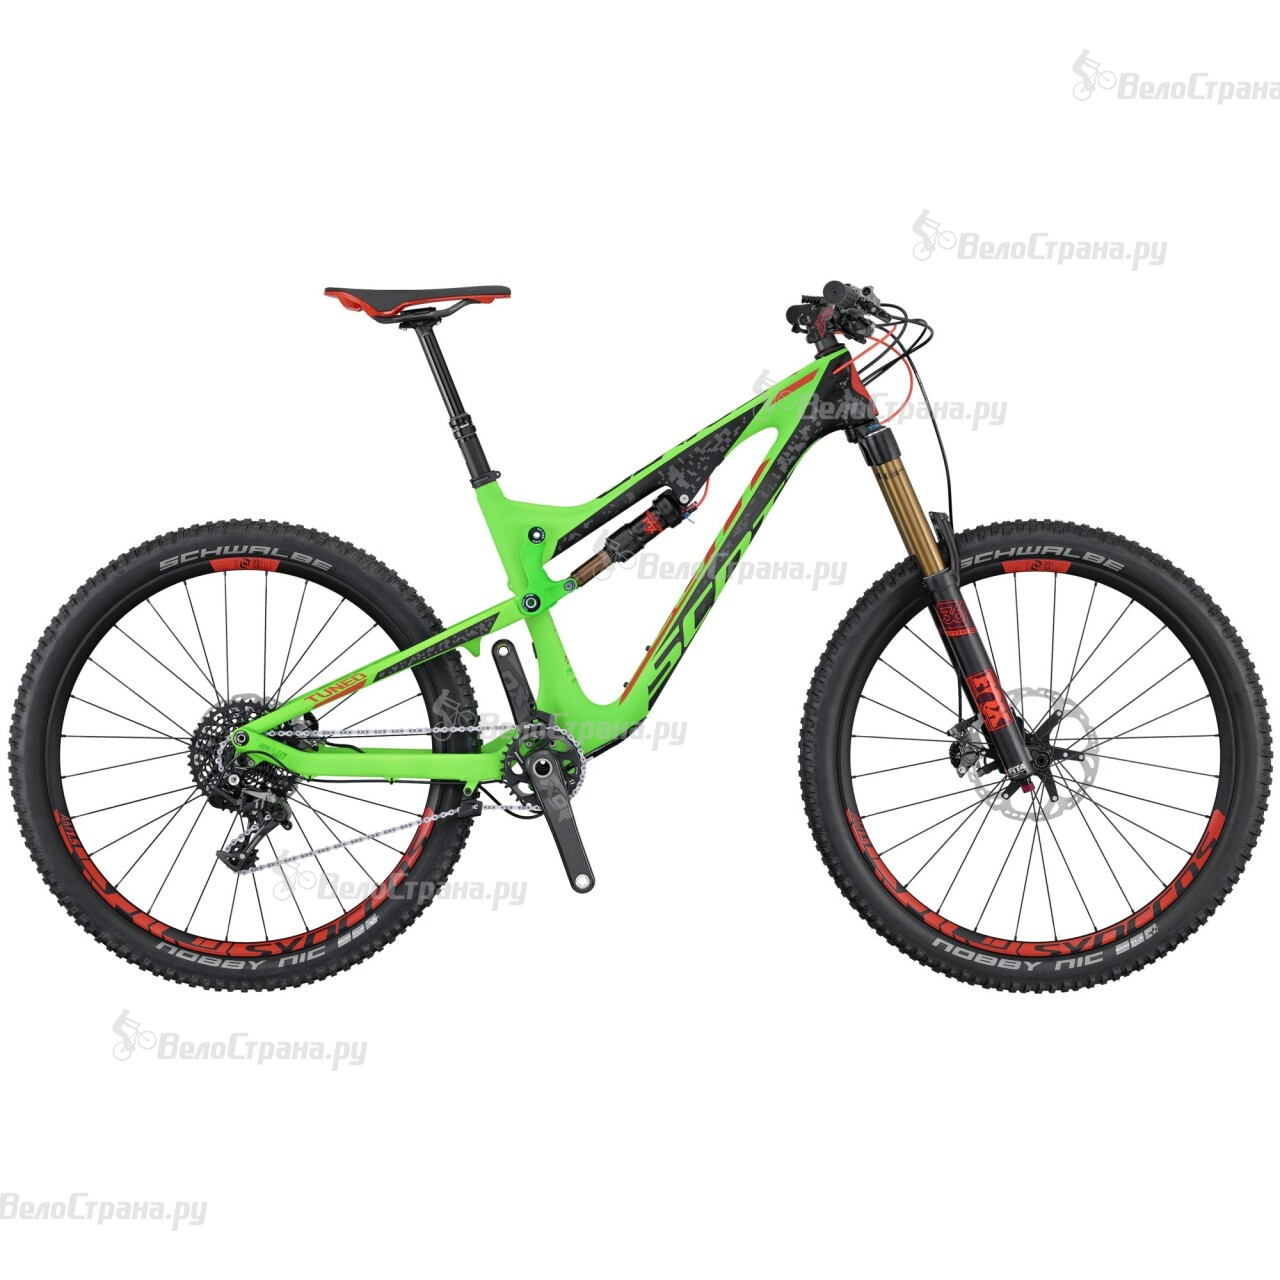 Велосипед Scott Genius LT 700 Tuned (2016) велосипед scott genius lt 720 2016